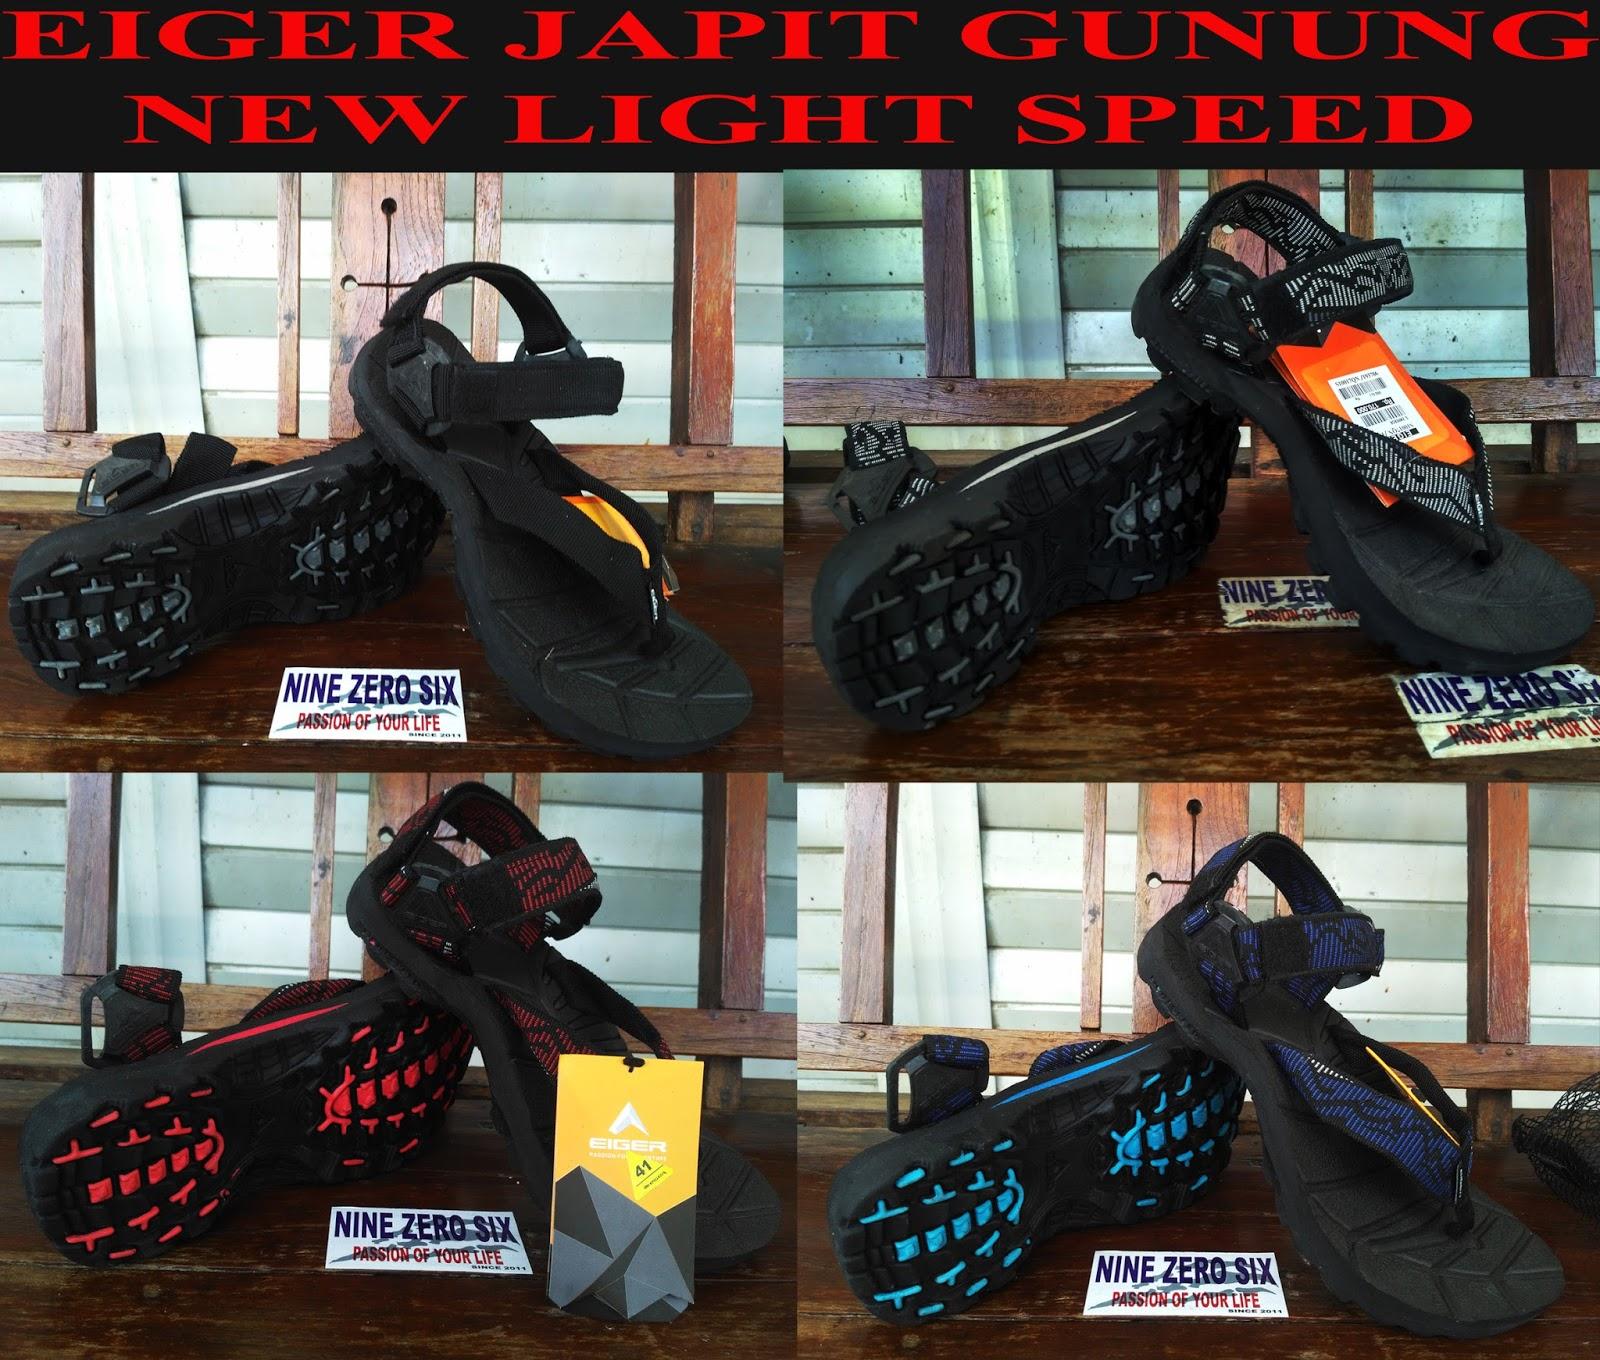 SANDAL EIGER JAPIT GUNUNG NEW LIGHT SPEED CROSSBAR BLACK SERIES